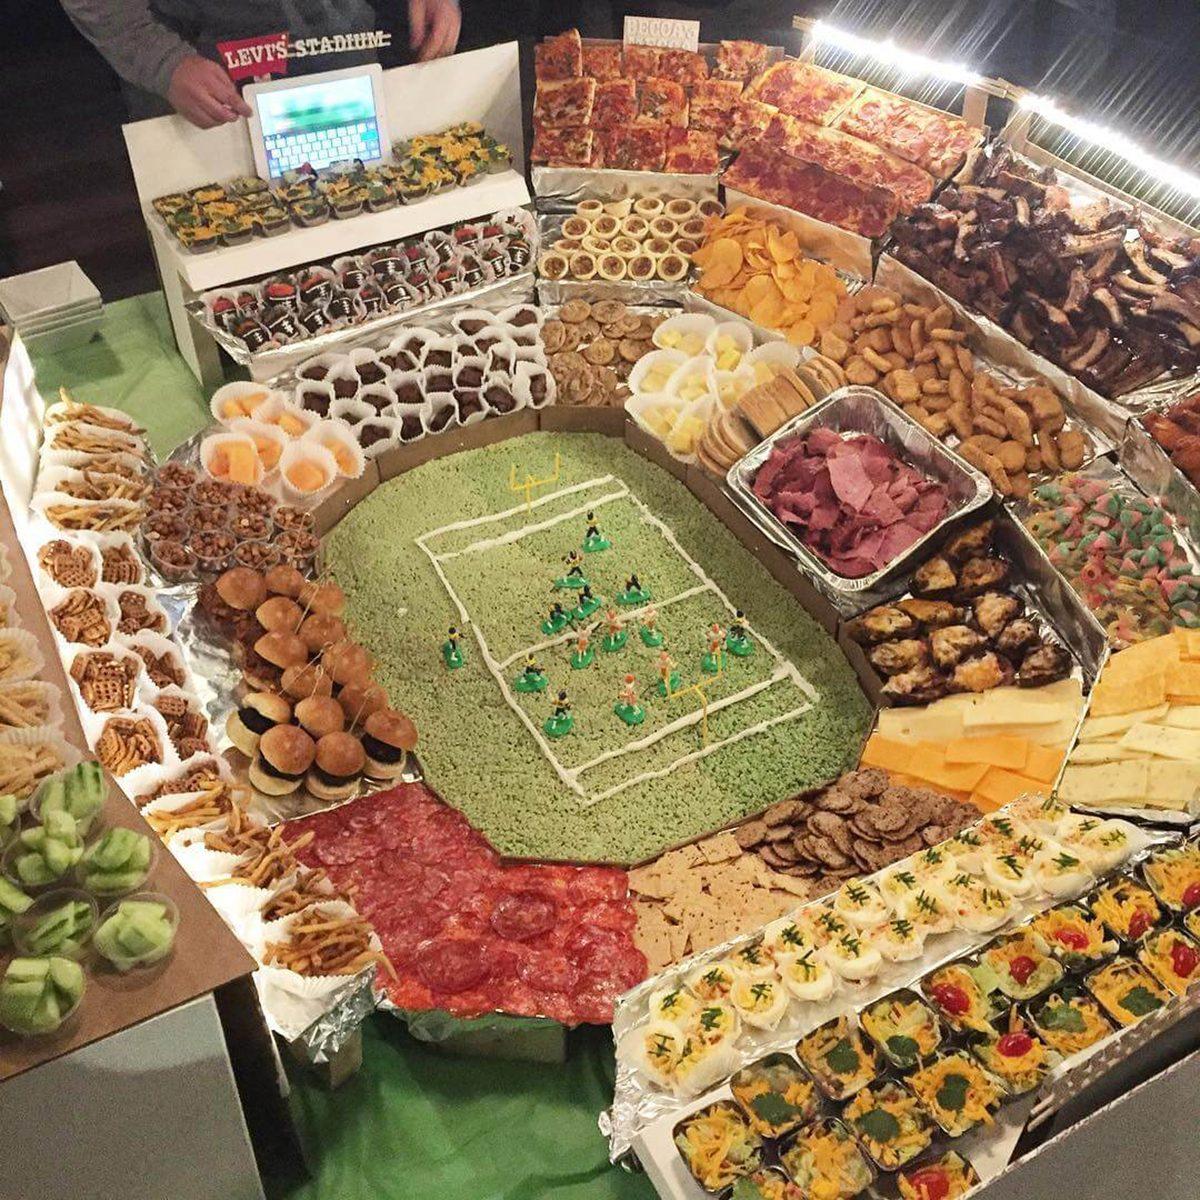 elaborate Super Bowl snack stadium with iPad scoreboard